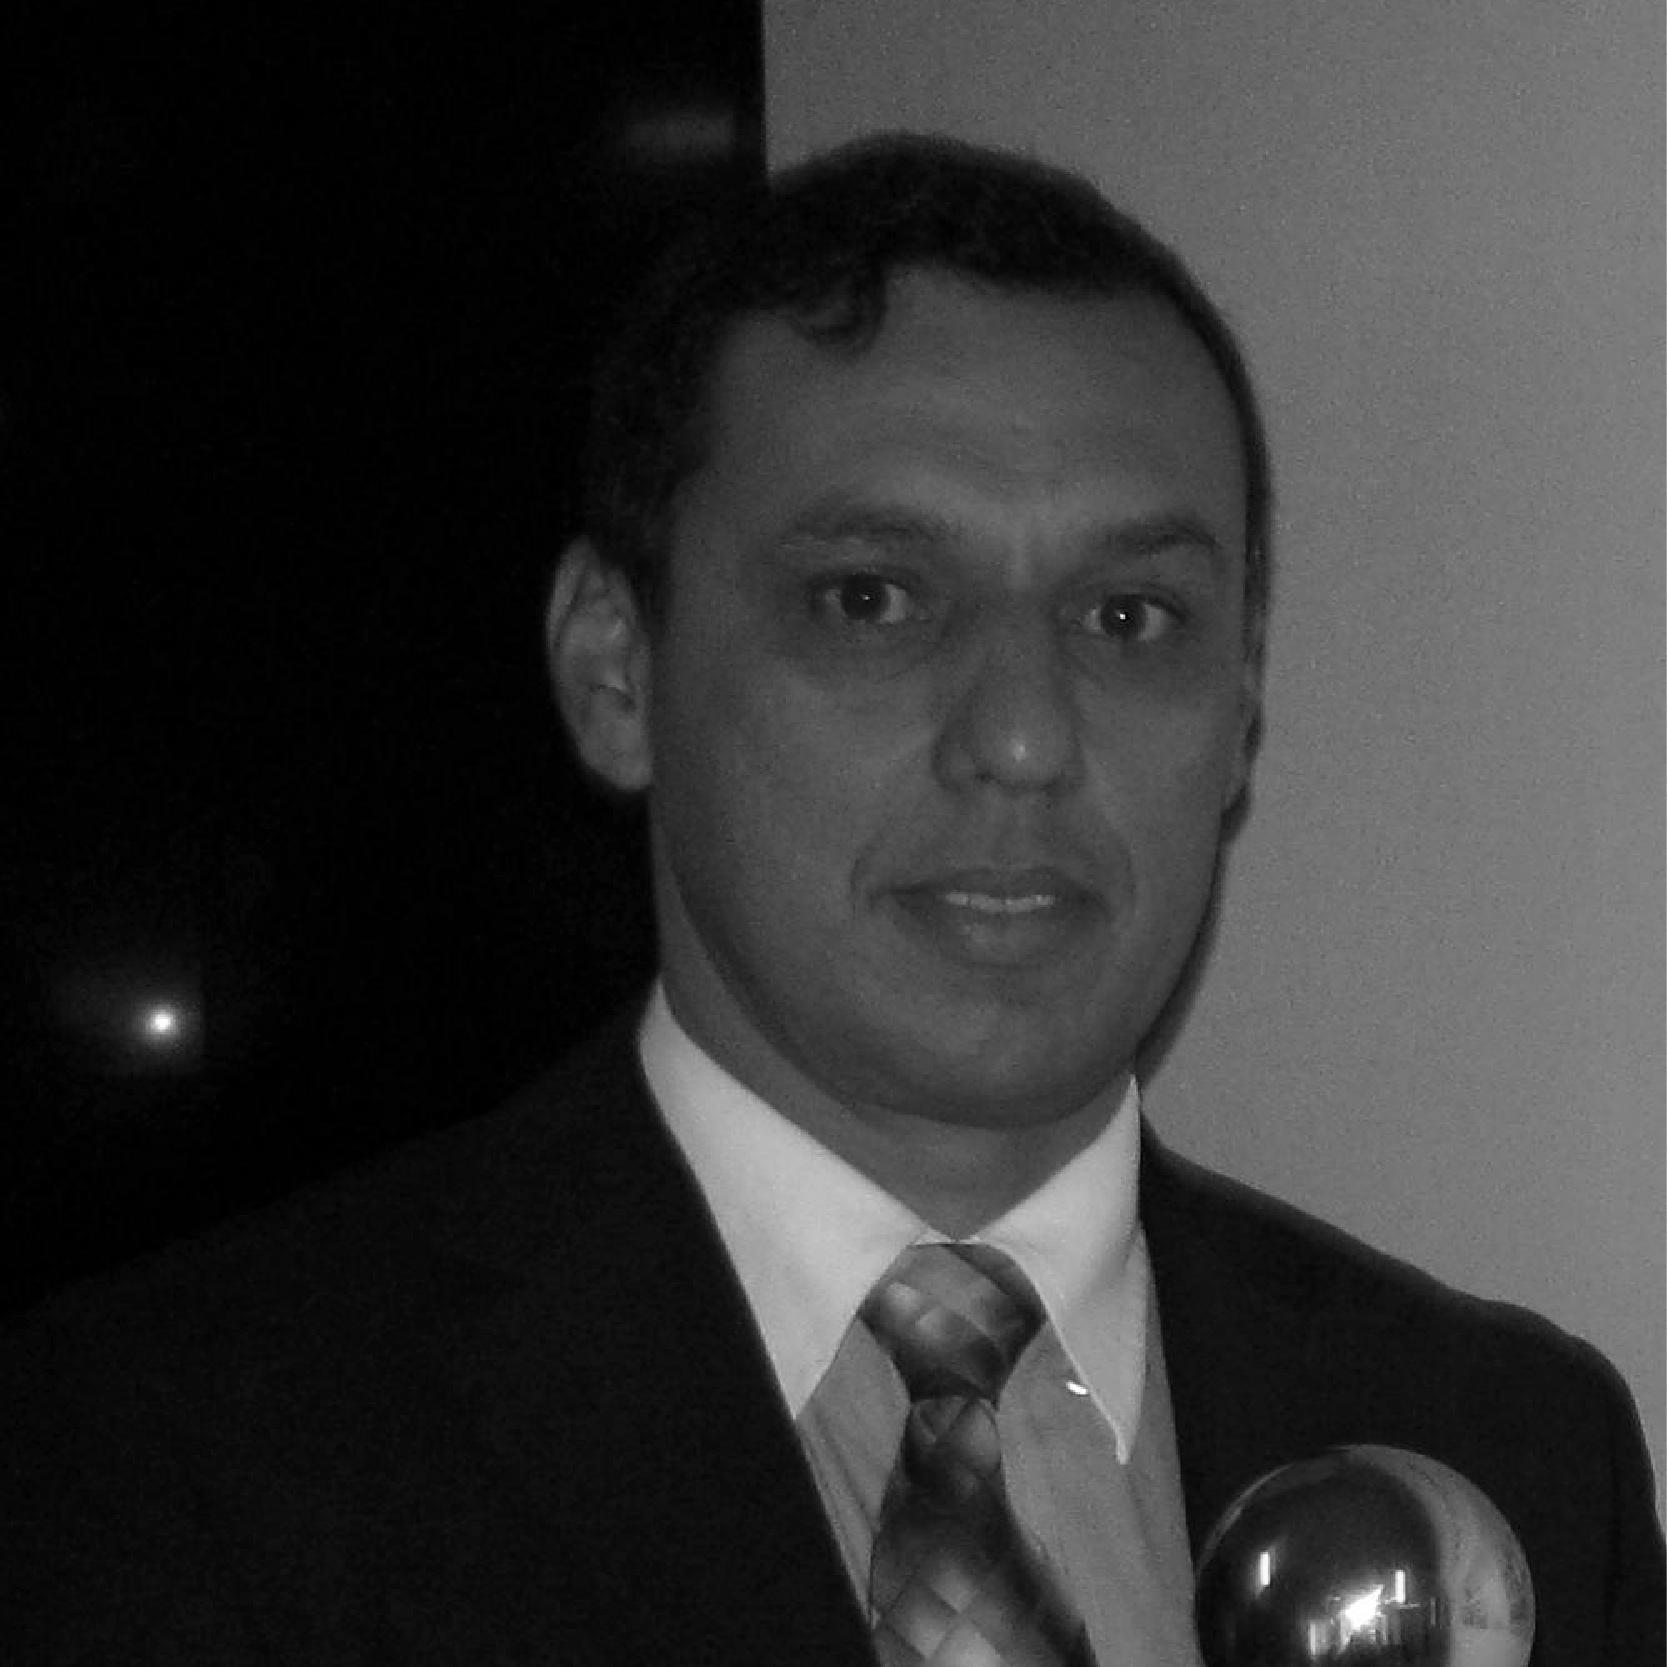 Antônio Dumont Machado do Nascimento